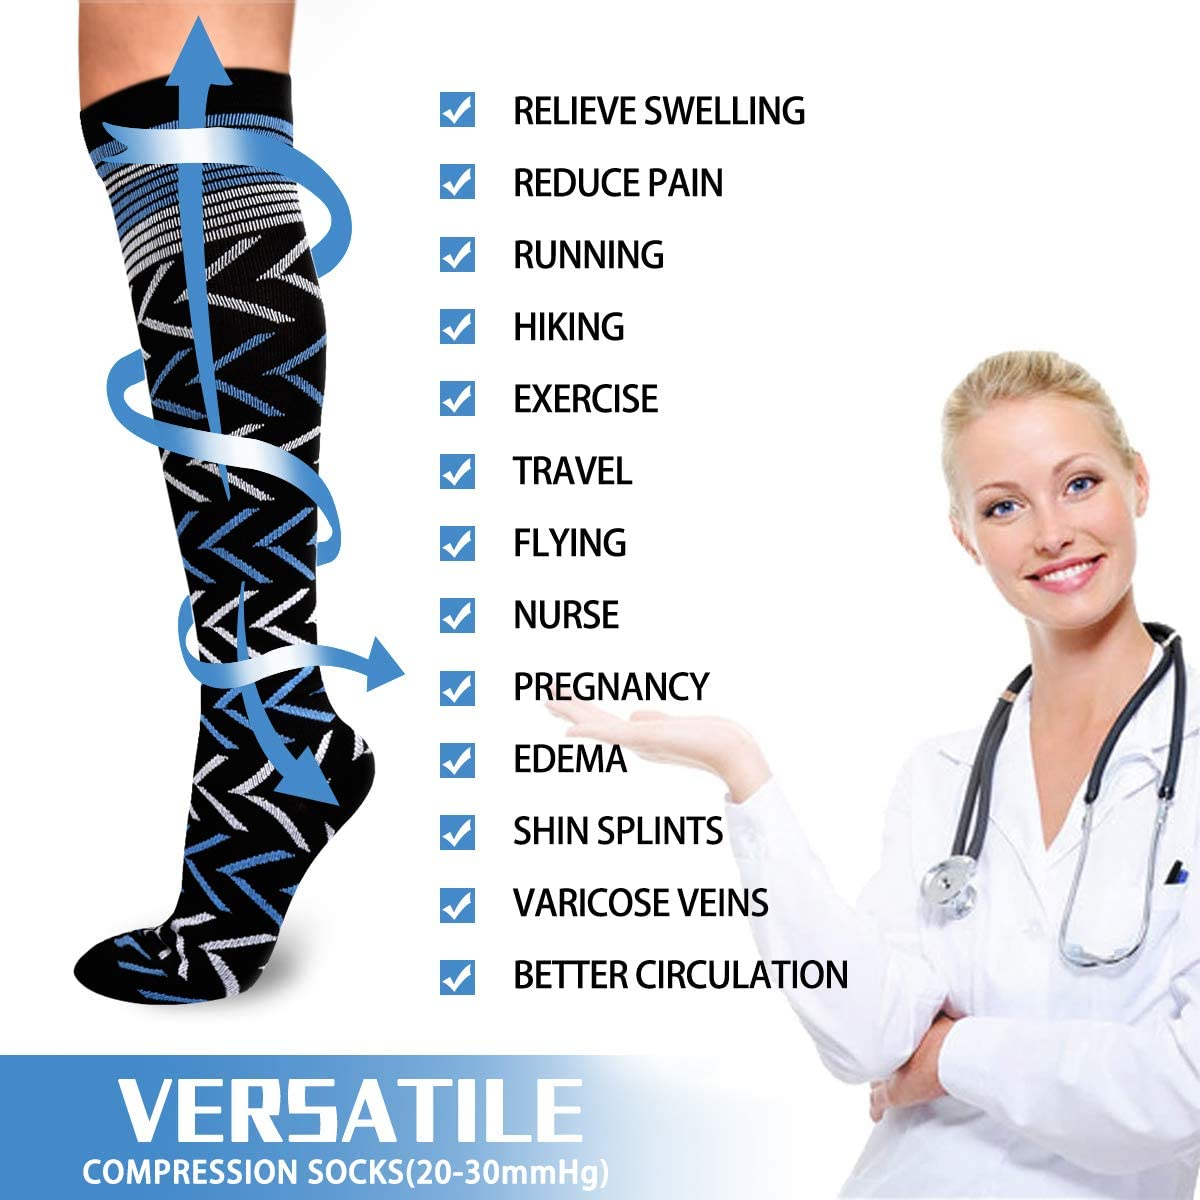 Nurse Edema Pregnancy Running /& Fitness Nursing Compression Socks for Women /& Men-for Medical Varicose Veins Black, L//XL Diabetic Travel /& Flight